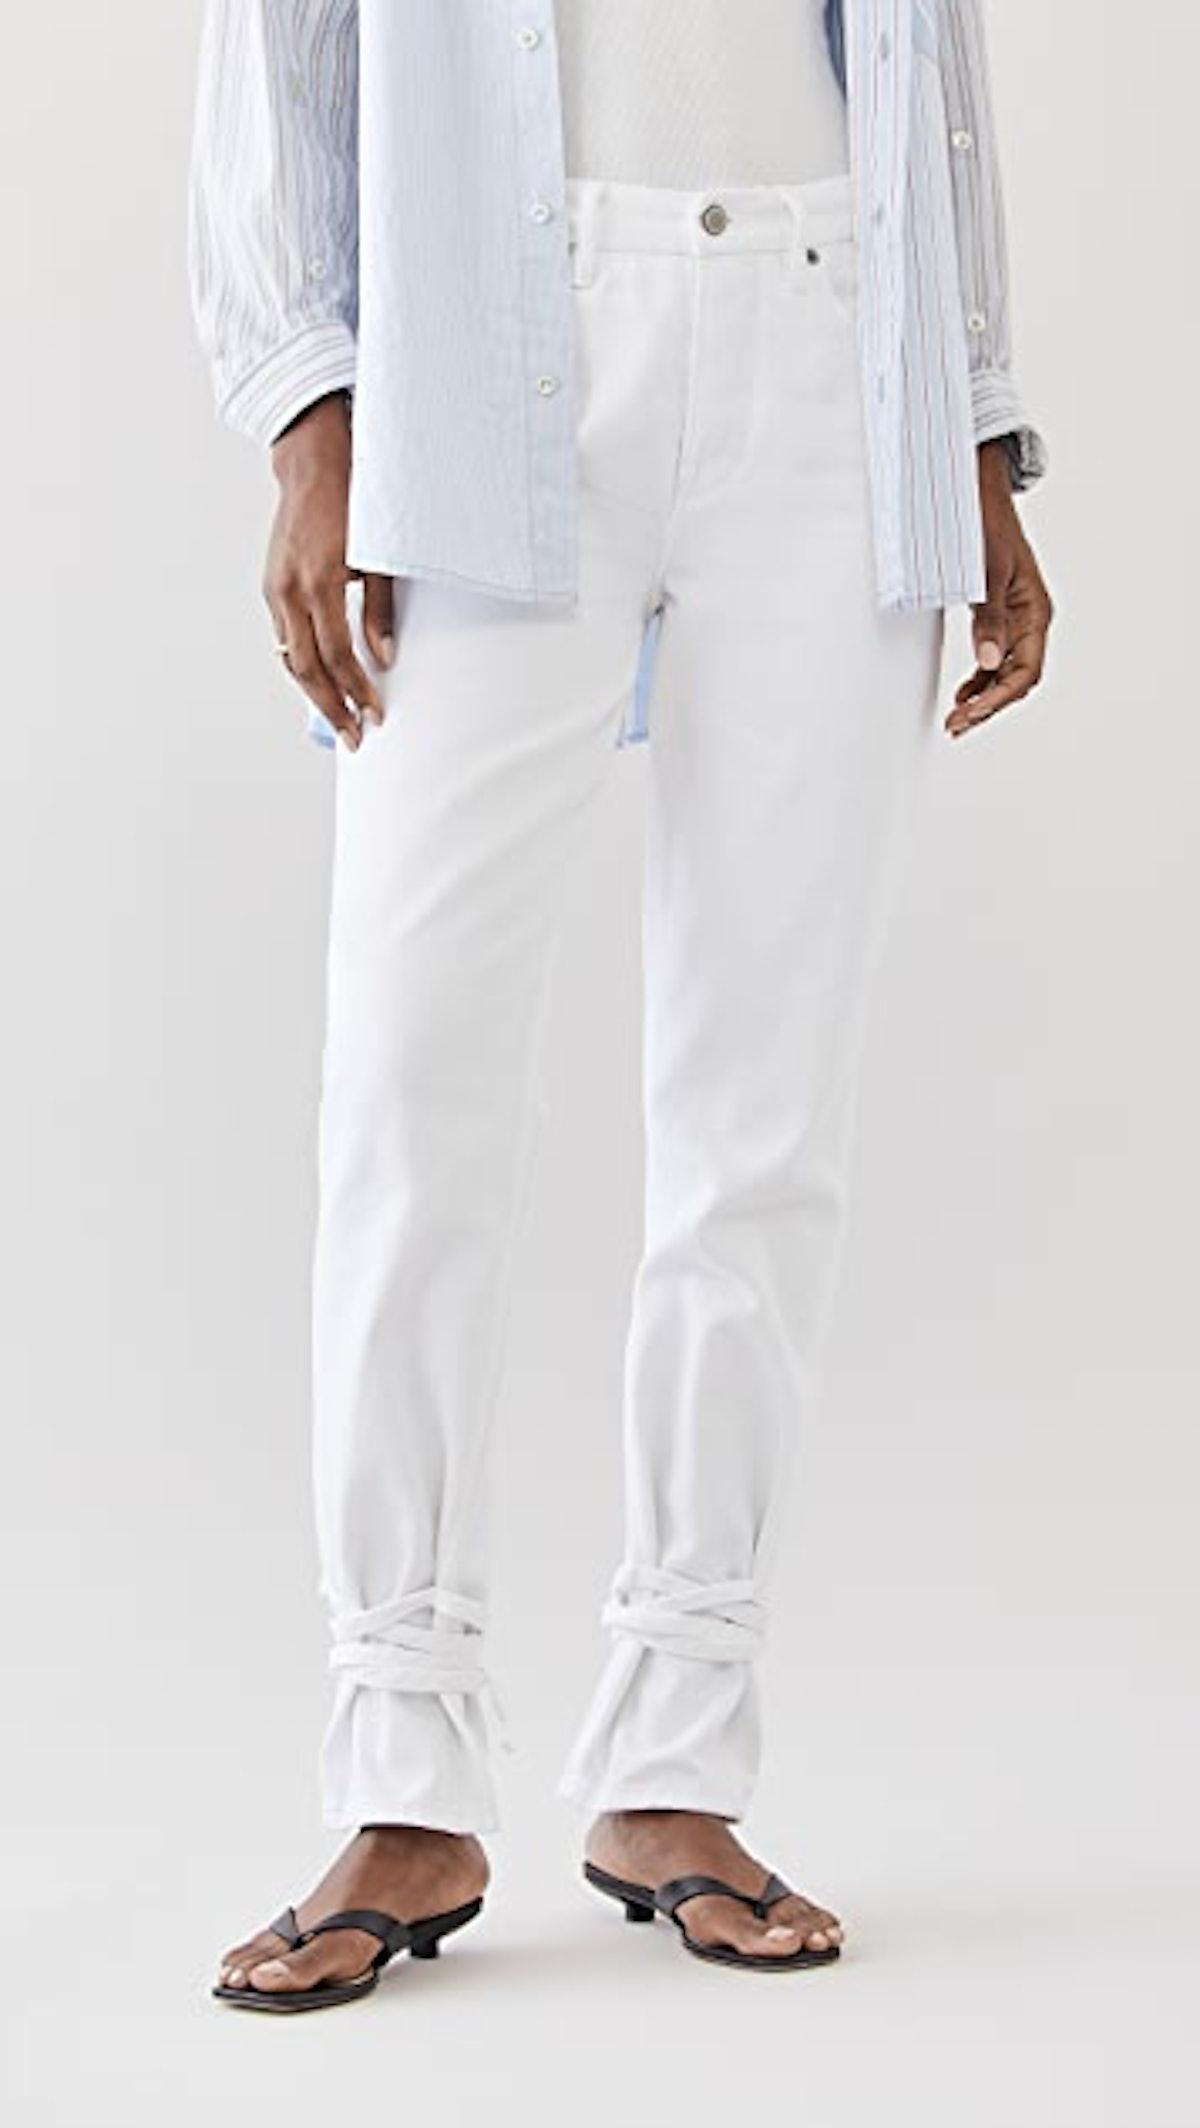 Women's Good Boy Ankle Wrap Jeans